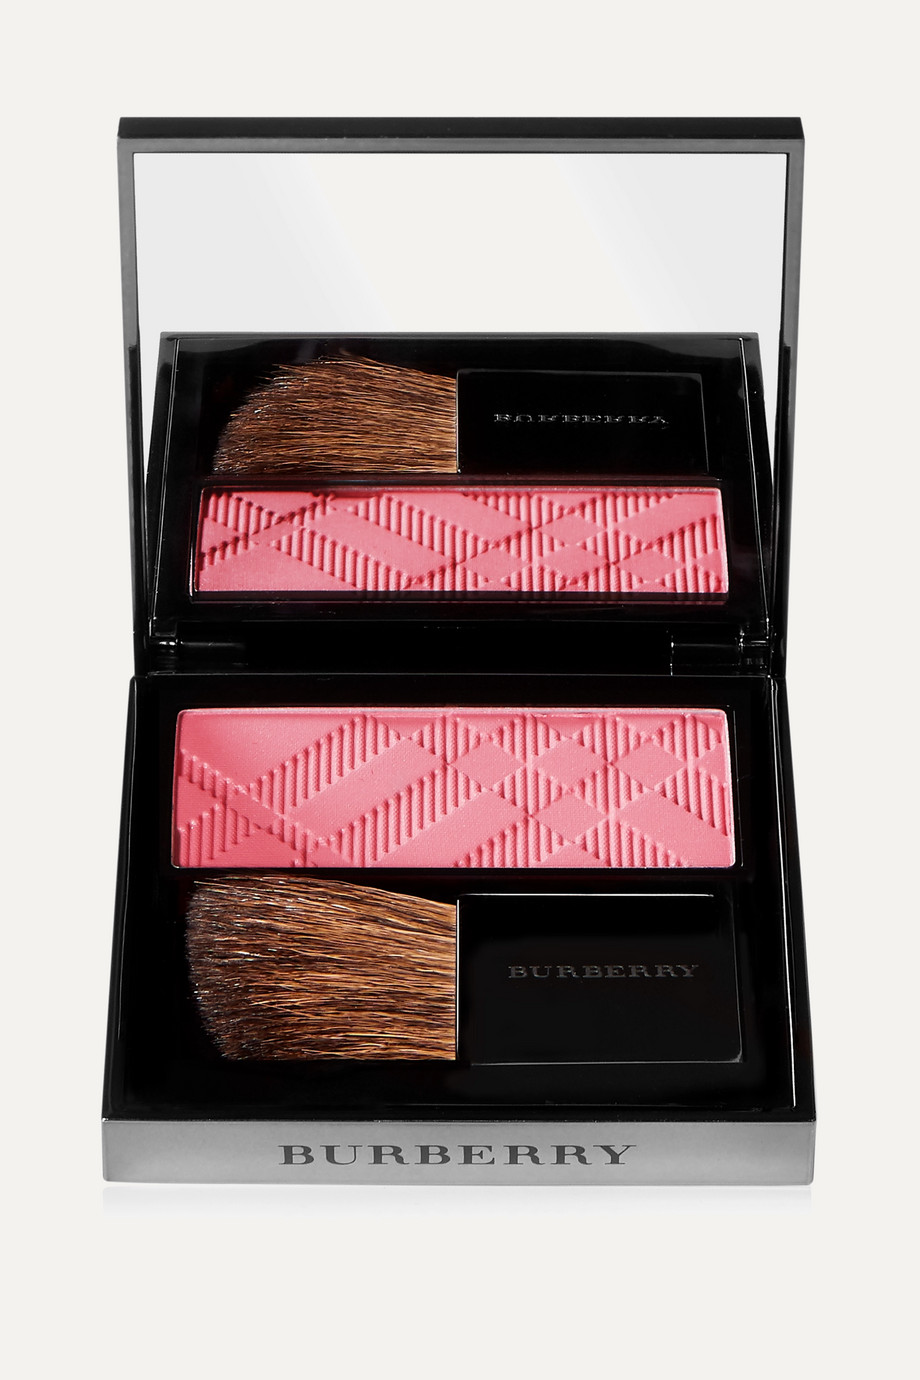 Burberry Beauty Light Glow Blush - Blossom No.05